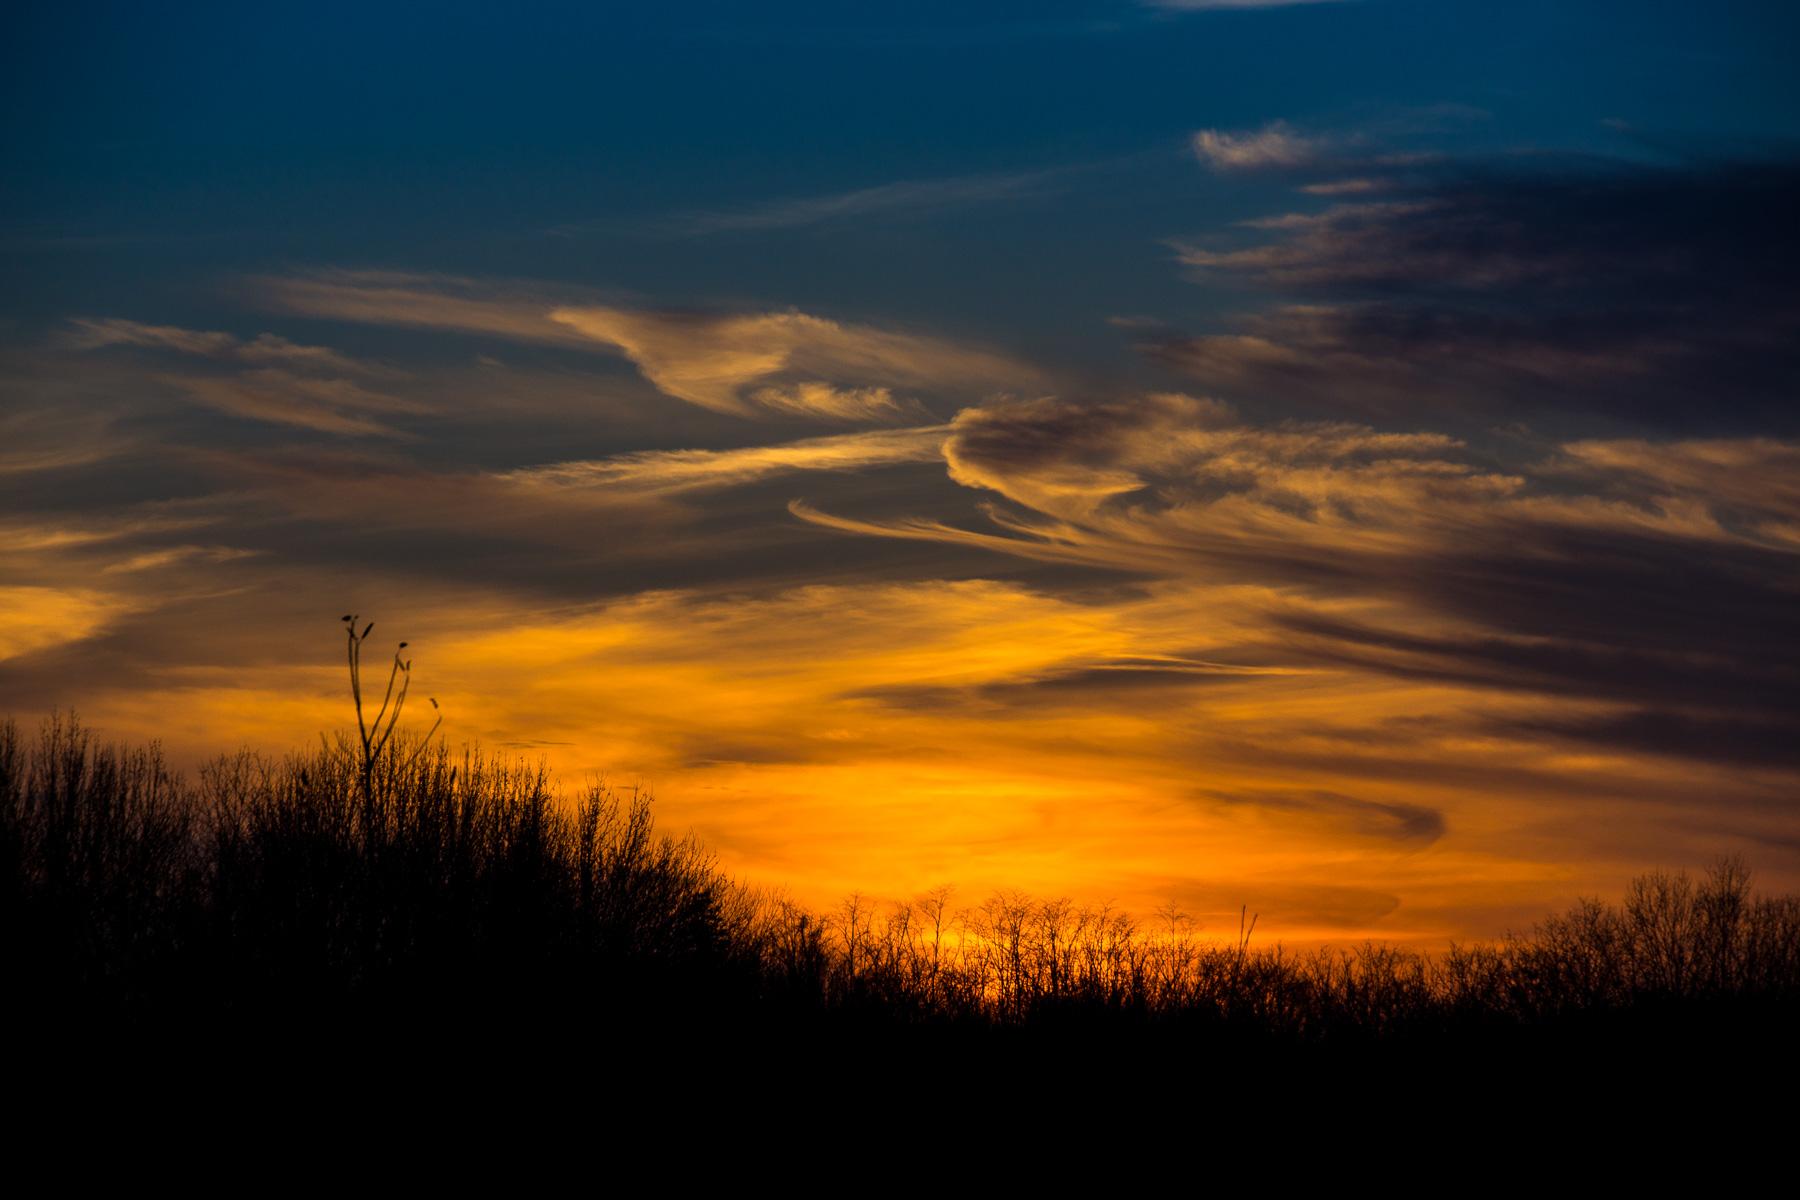 Sunset Swirls